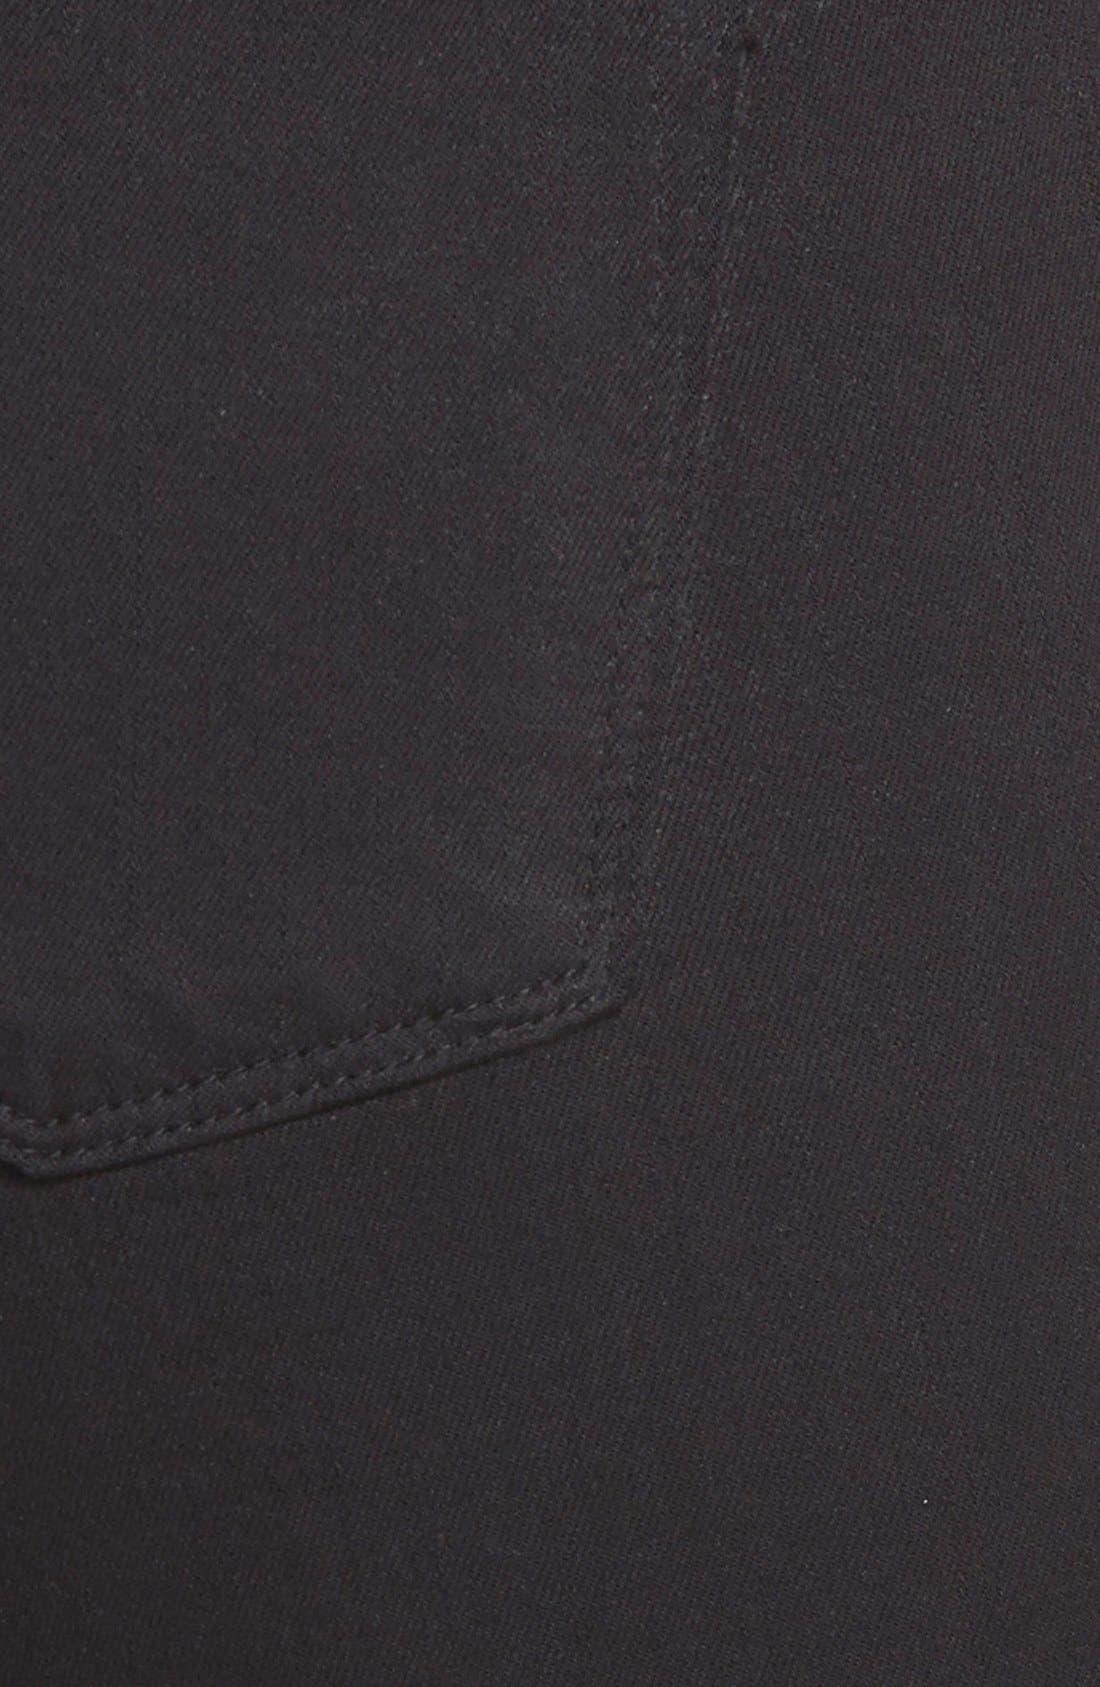 Alternate Image 3  - J Brand '811' Mid Rise Skinny Jeans (Black) (Nordstrom Exclusive)